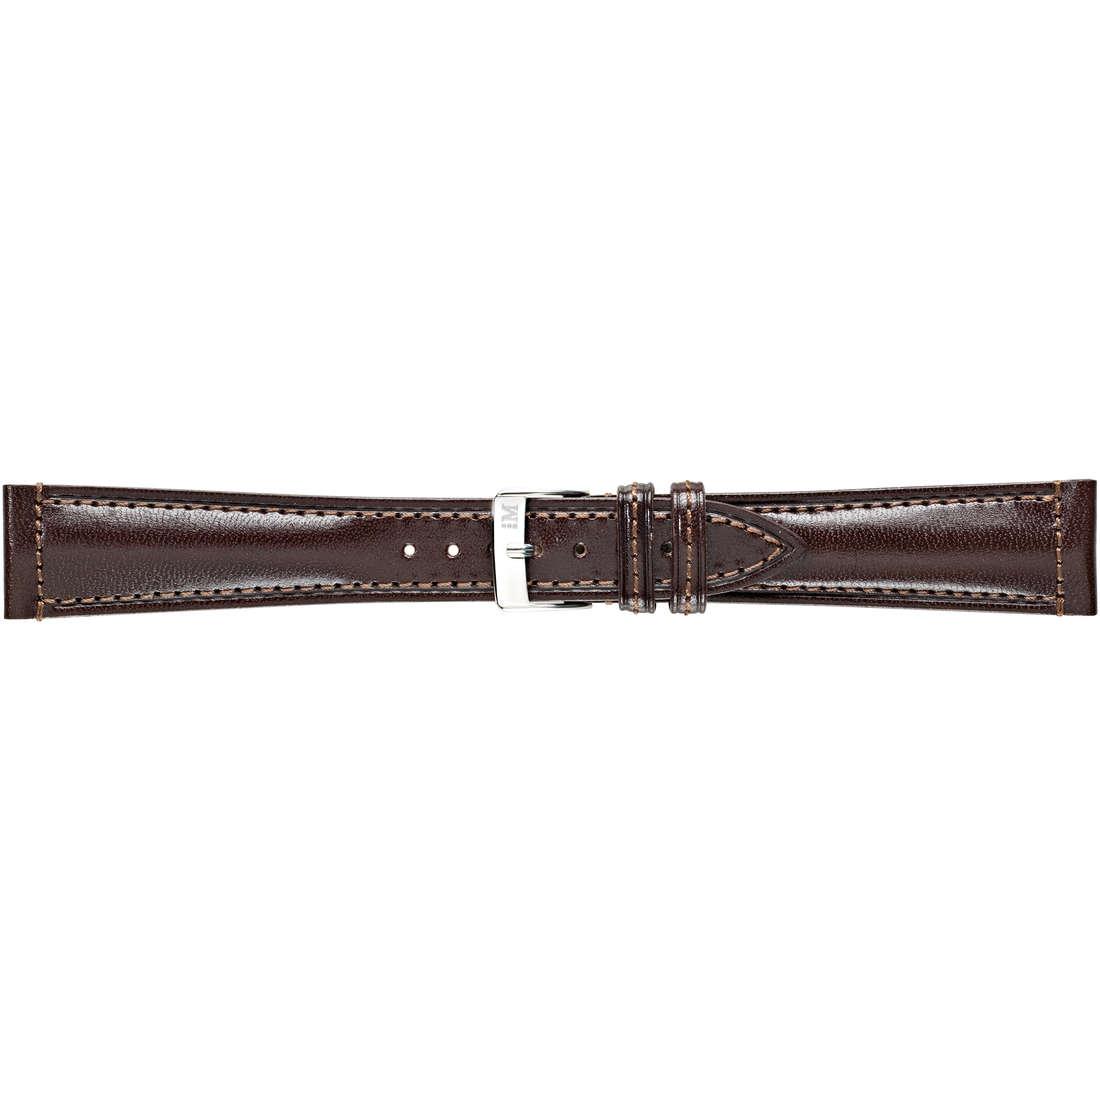 watch watch bands watch straps man Morellato Manufatti A01U0895403032CR18